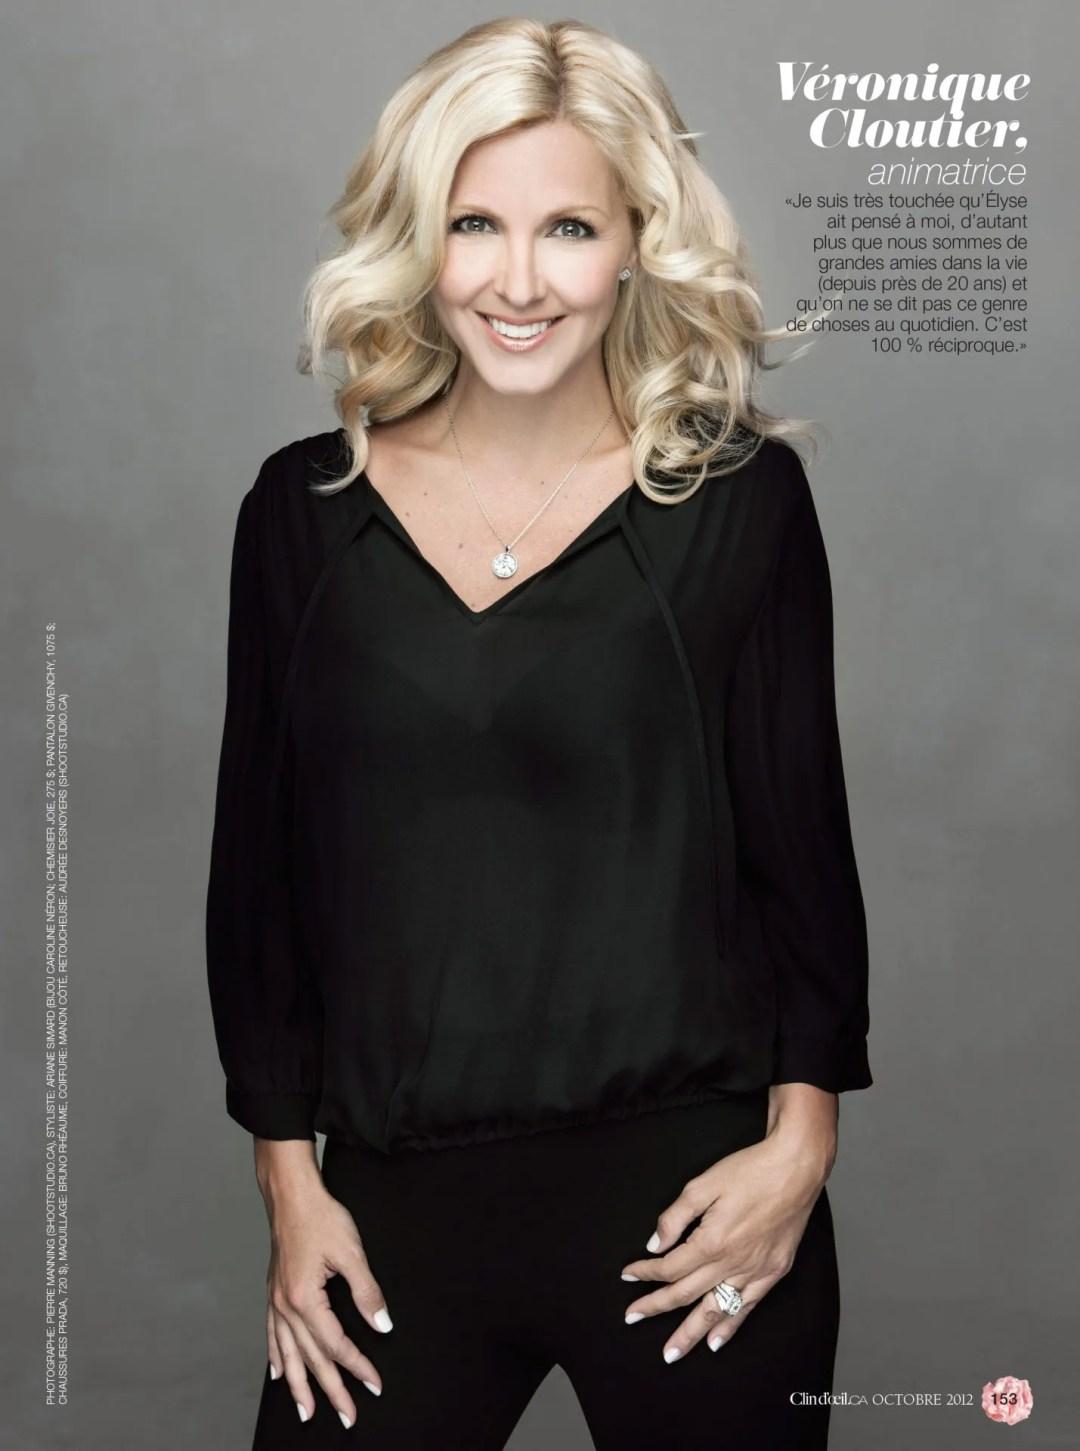 Veronique Cloutier Magazine Clin Doeil 2012 par Ariane Simard